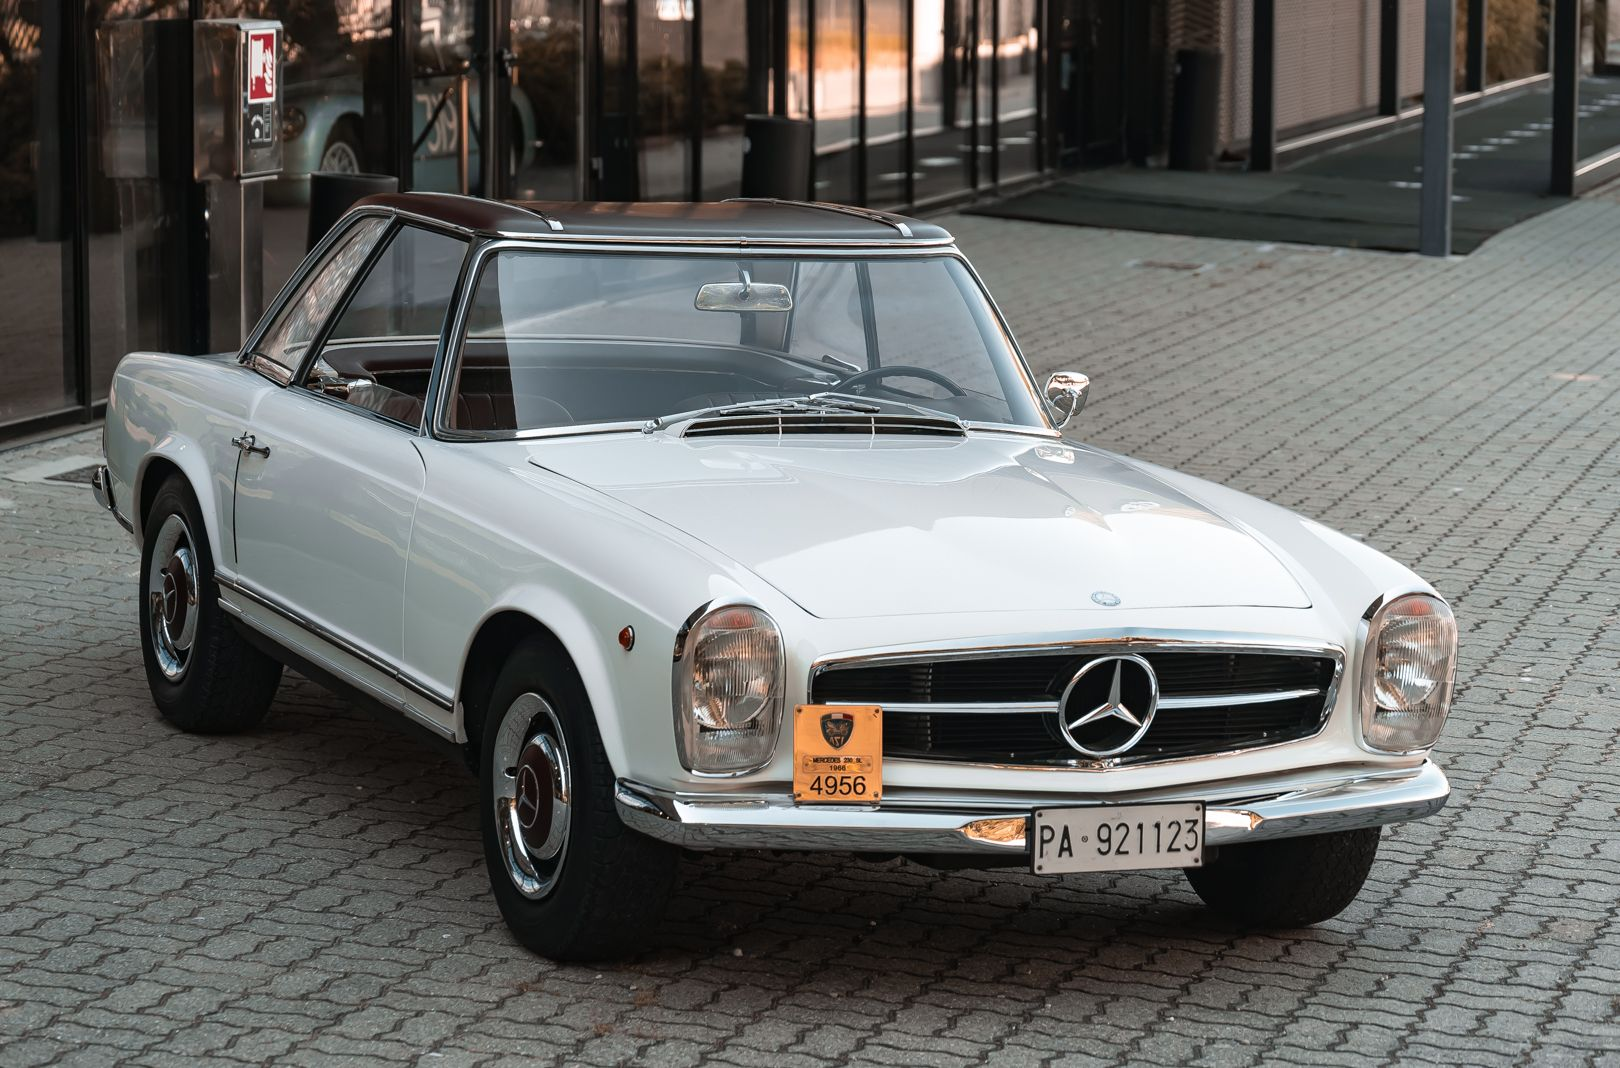 1966 Mercedes Benz SL230 Pagoda 76017